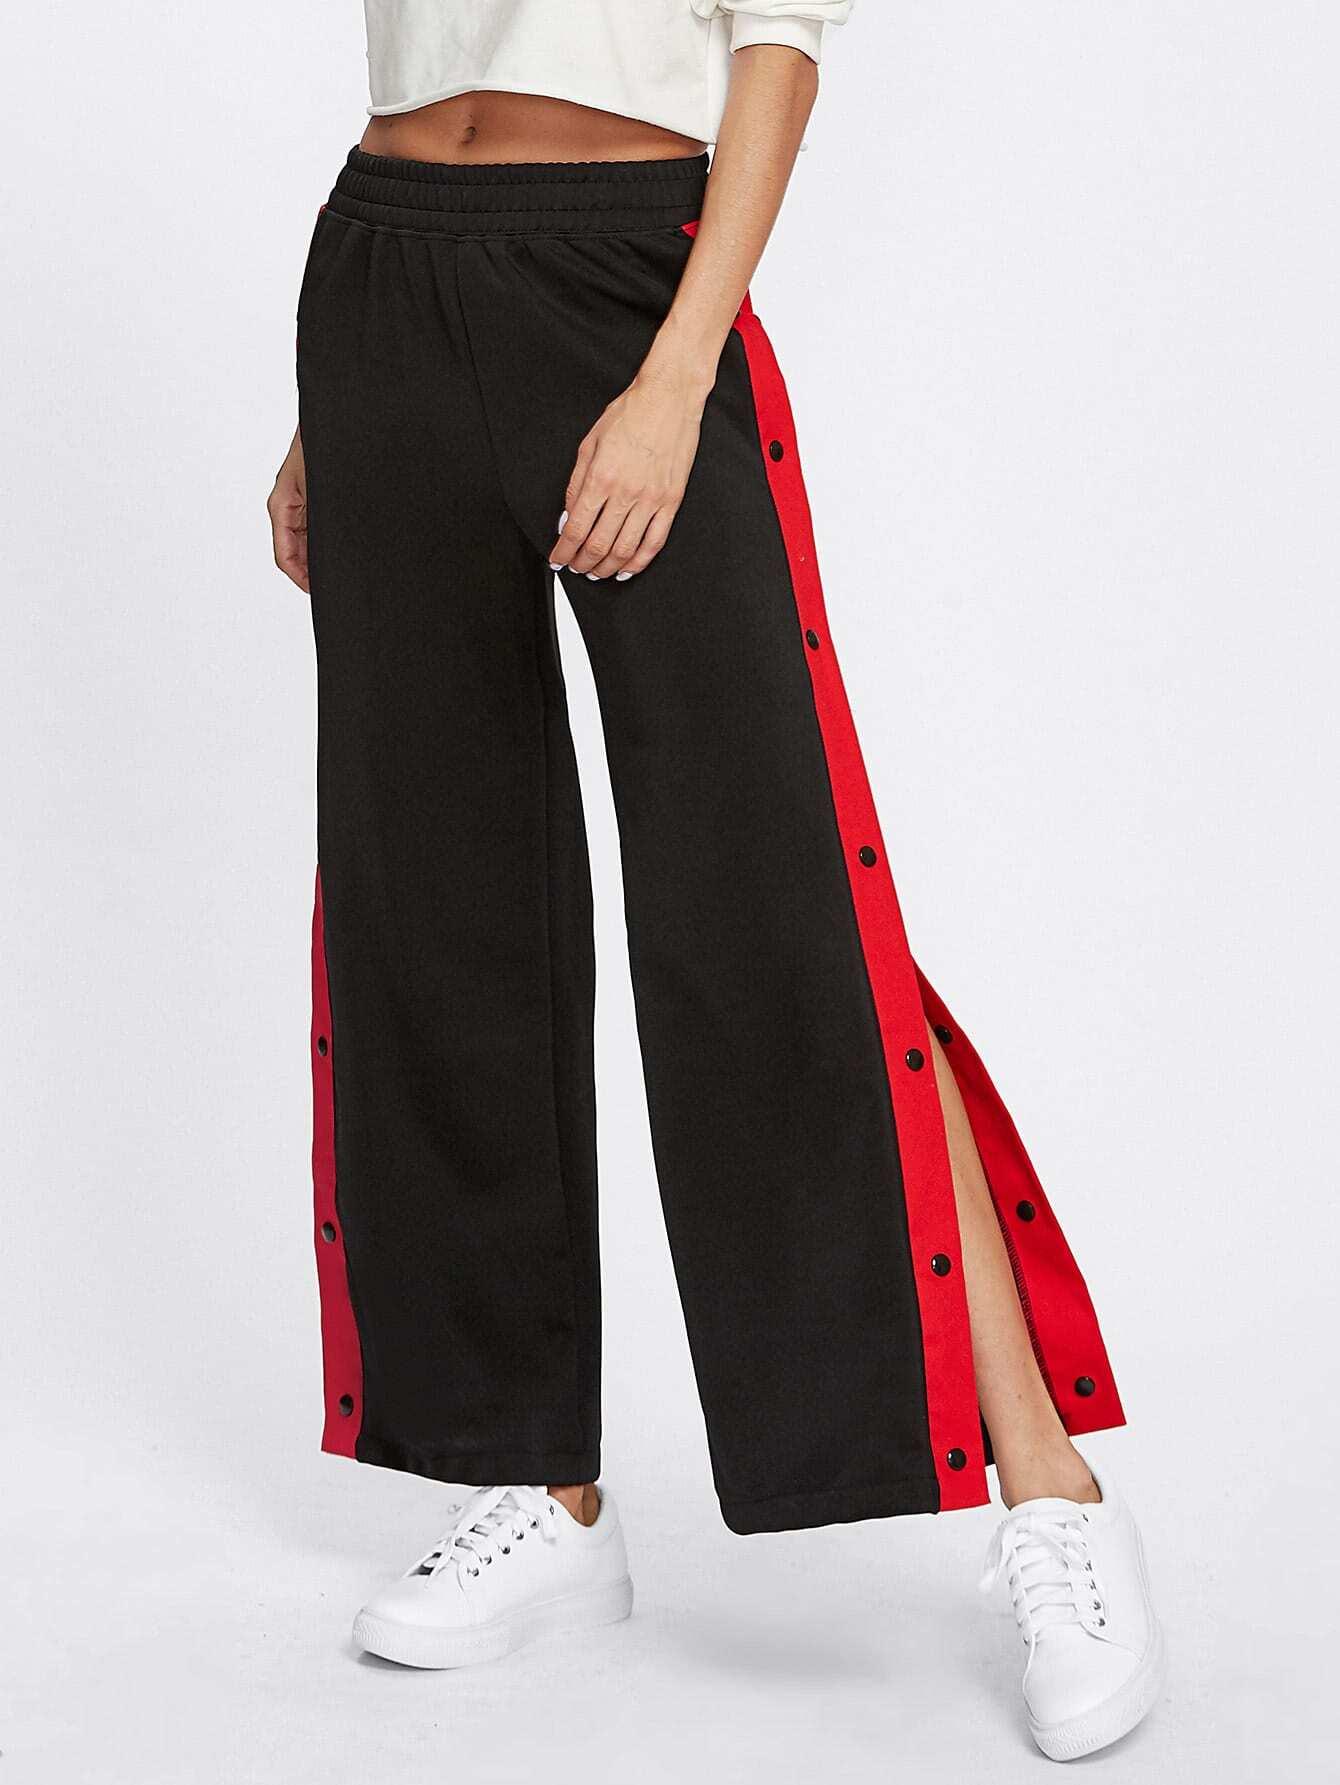 Contrast Snap Button Side Culotte Pants Emmacloth Women